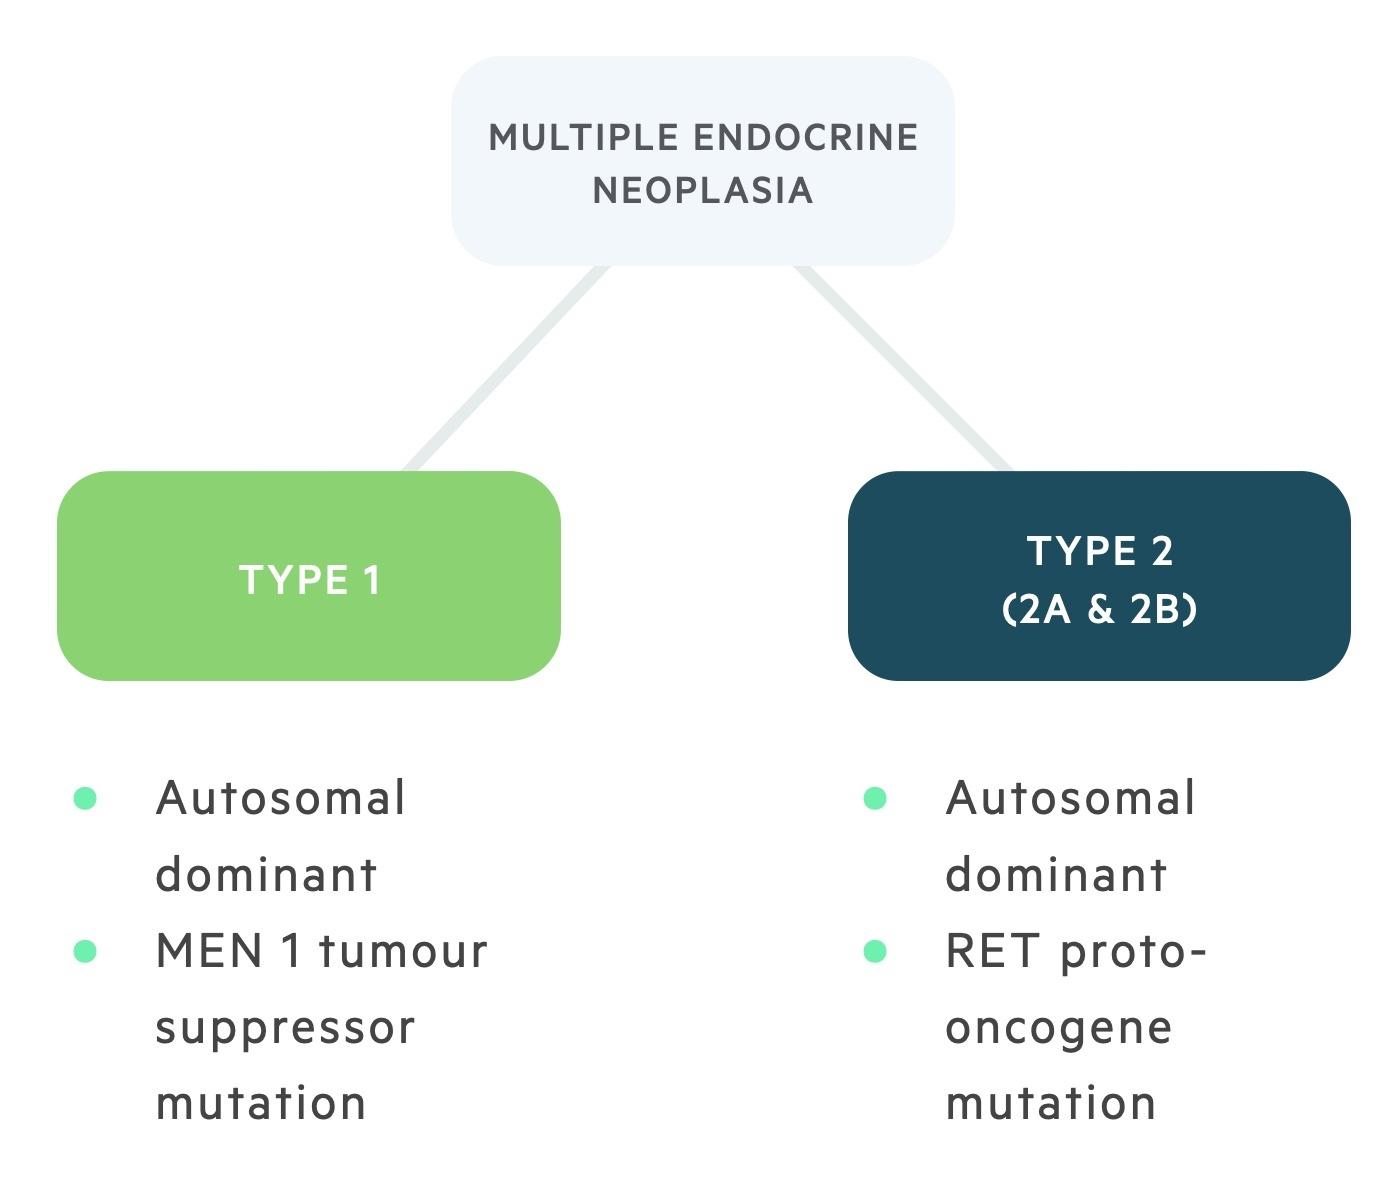 Types of multiple endocrine neoplasia